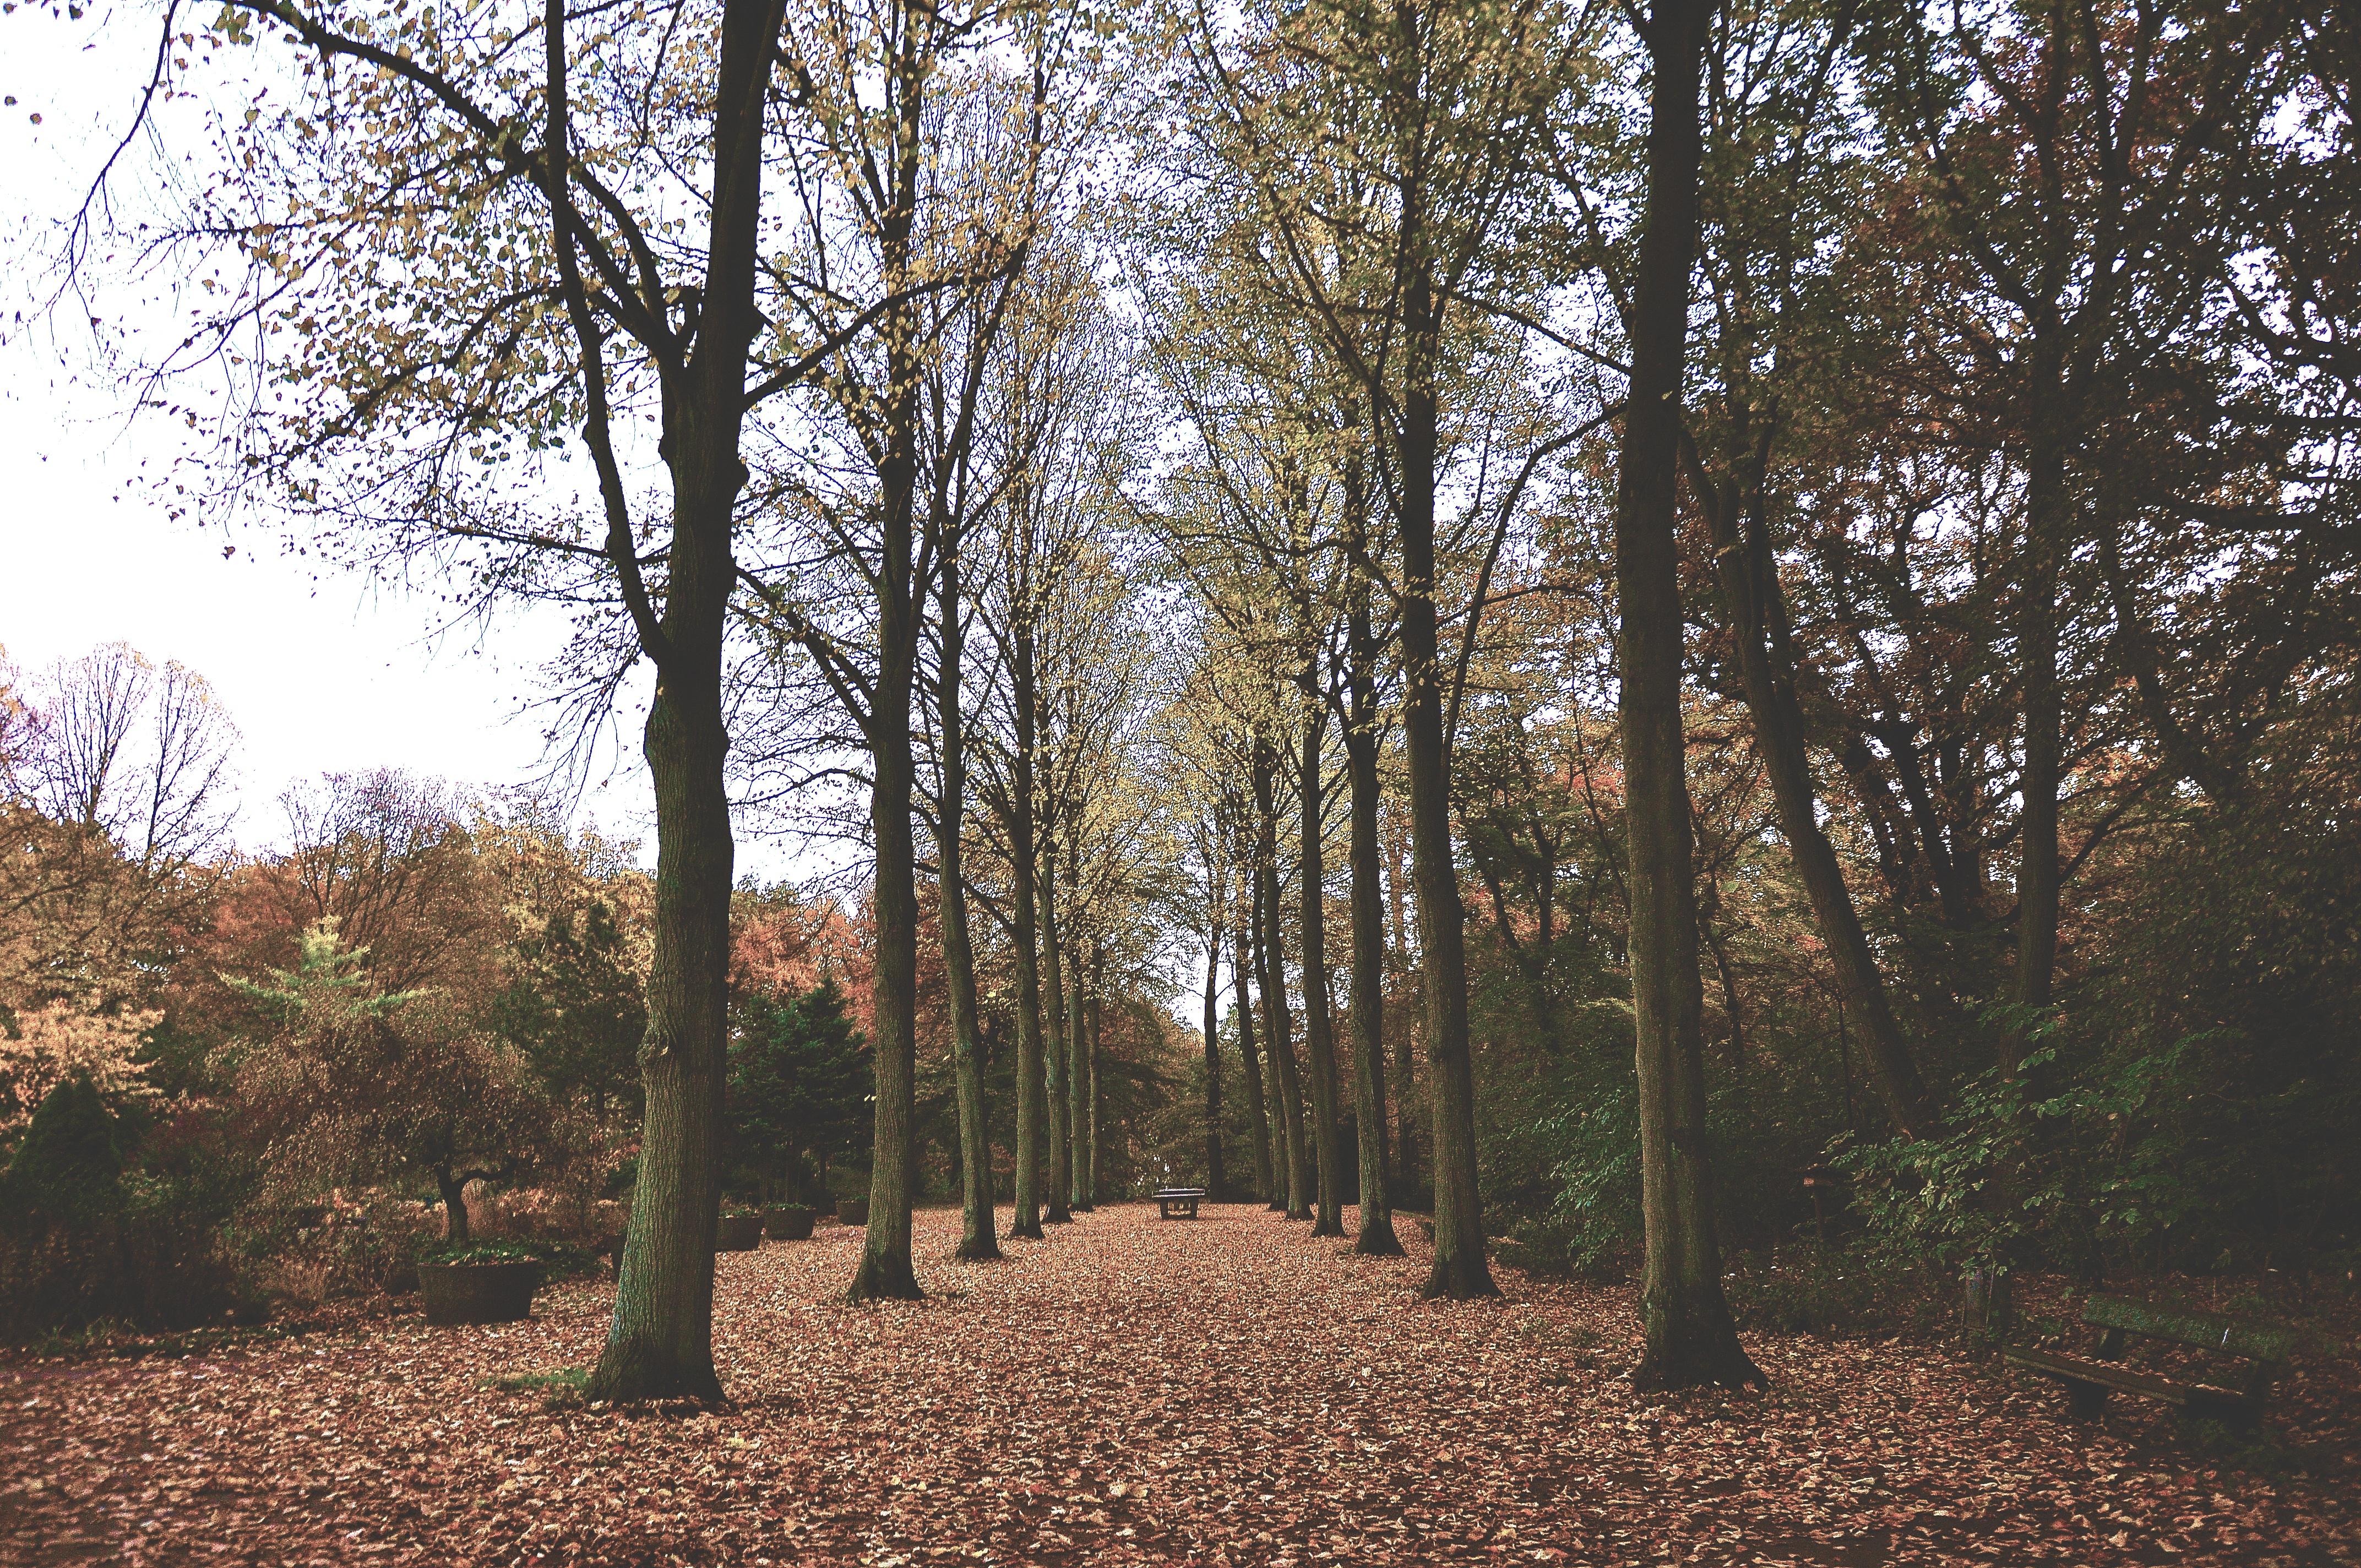 Fallen Leaves, Nature, Season, Leave, Leaf, HQ Photo